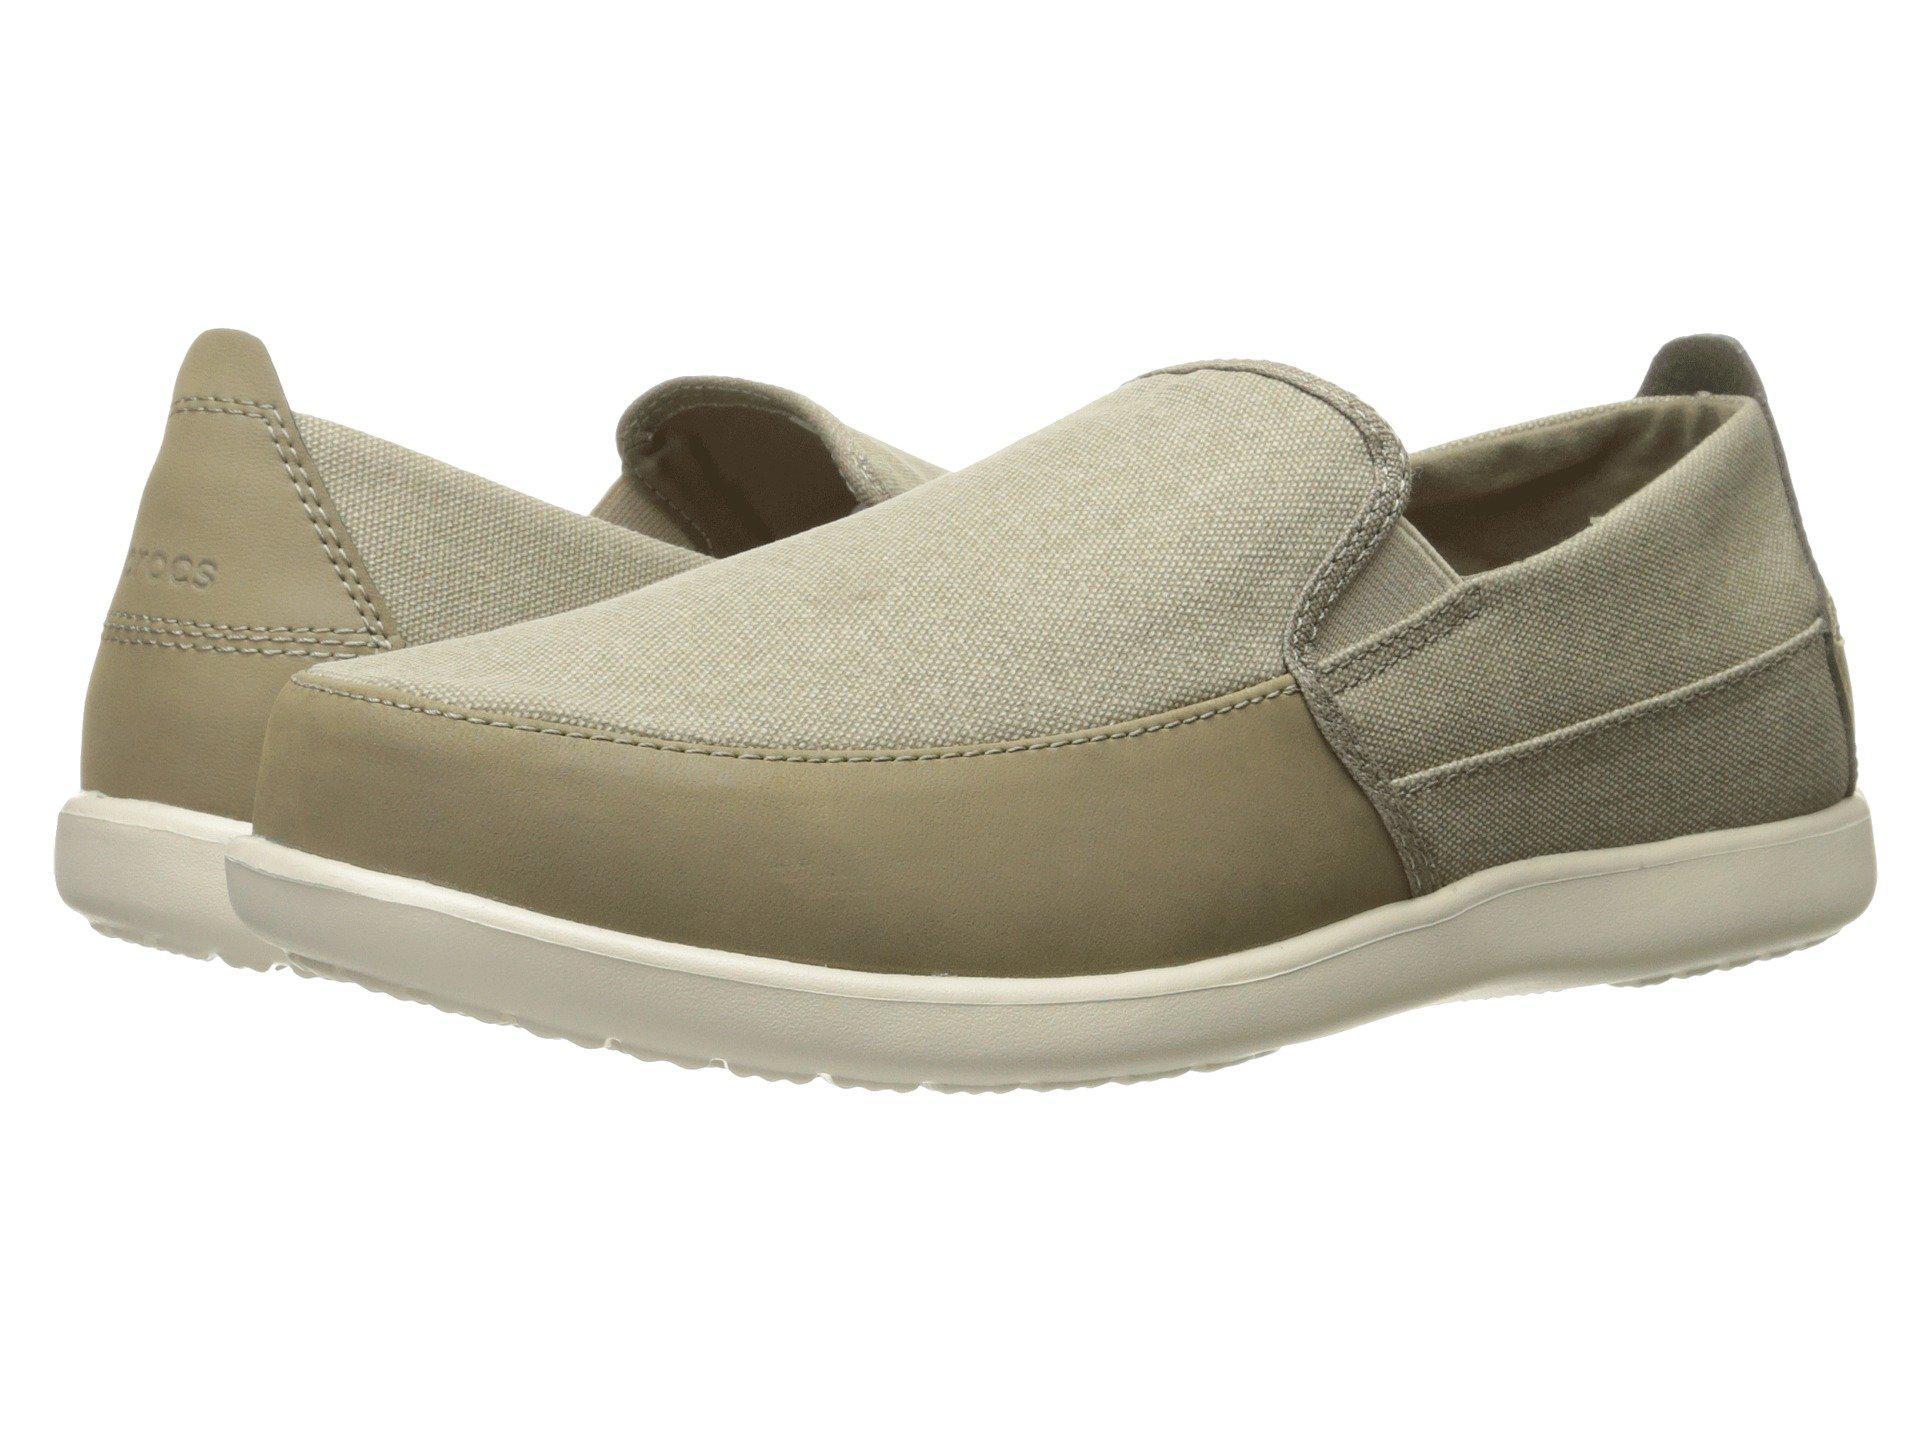 39f14d8cf9205c Lyst - Crocs™ Santa Cruz Deluxe Slip-on in Natural for Men